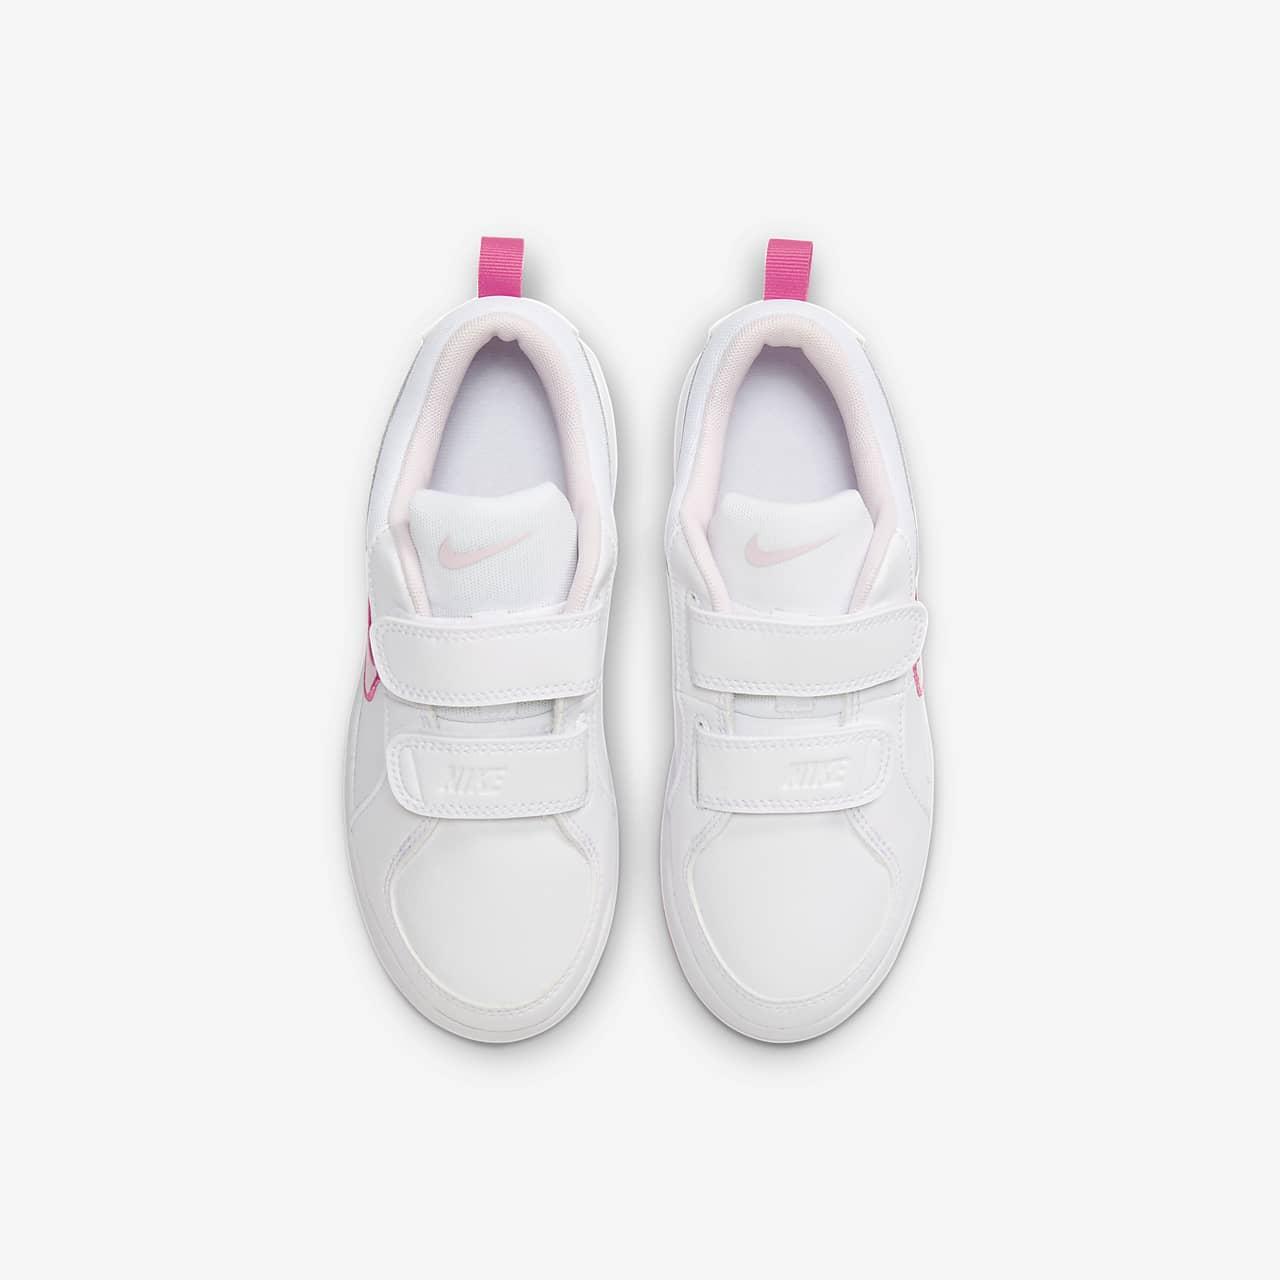 Sko Nike Pico 4 för tjejer (storlek 27,5 35) Vit   Barnskor  